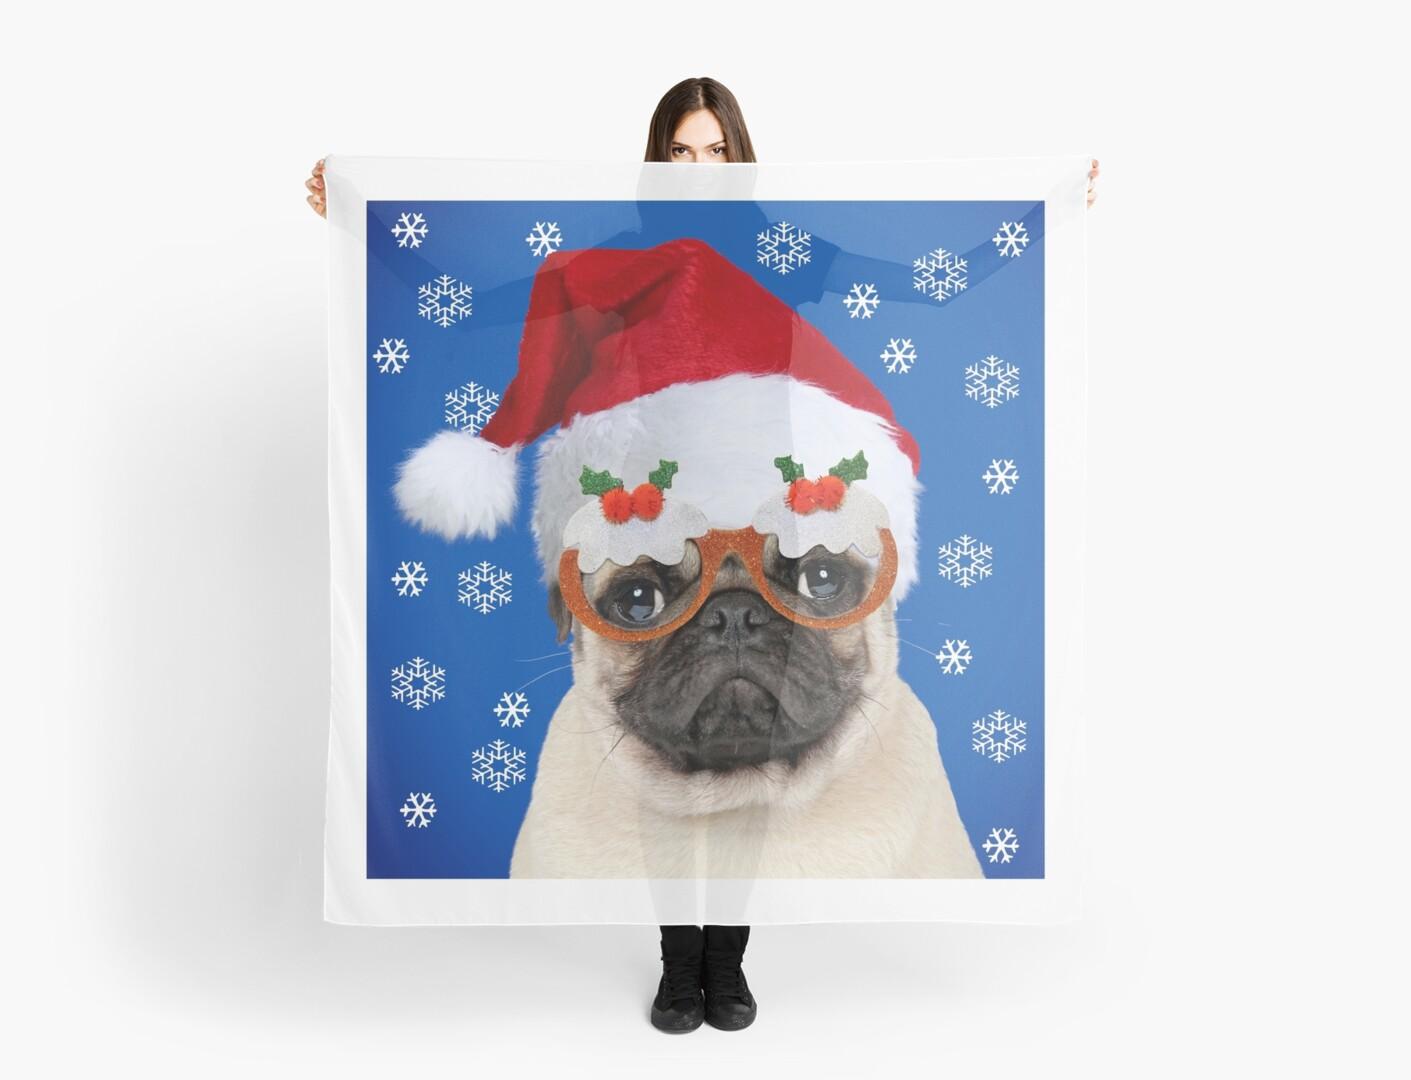 Pug dog wearing Christmas hat and glasses